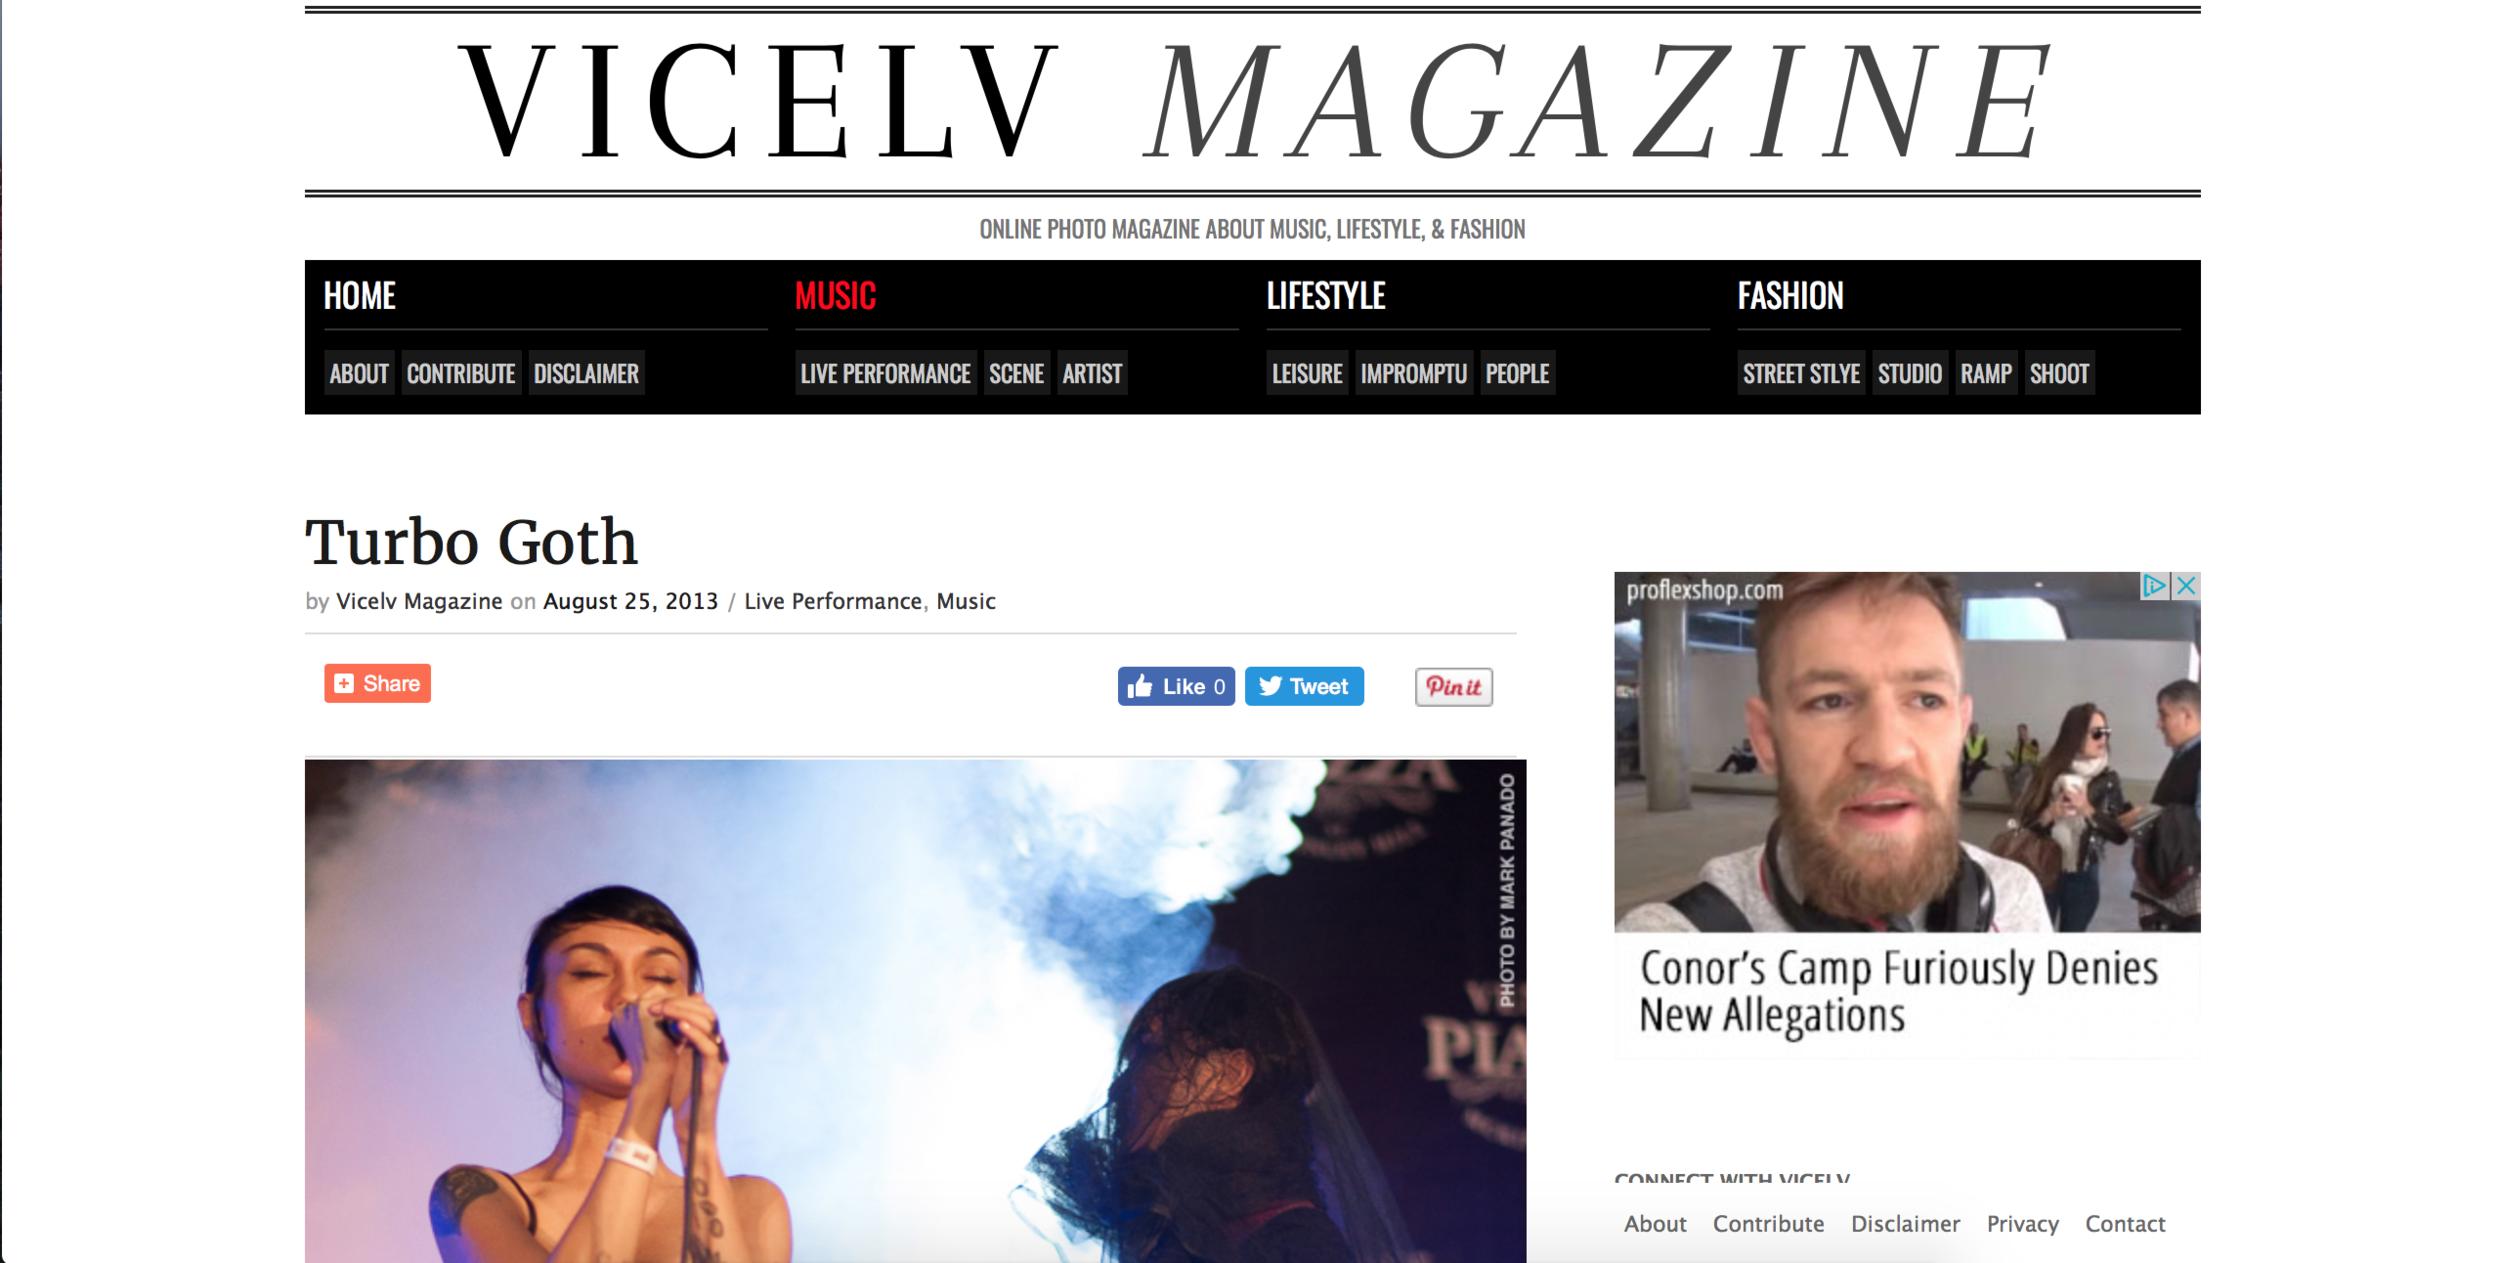 Vicelv Magazine